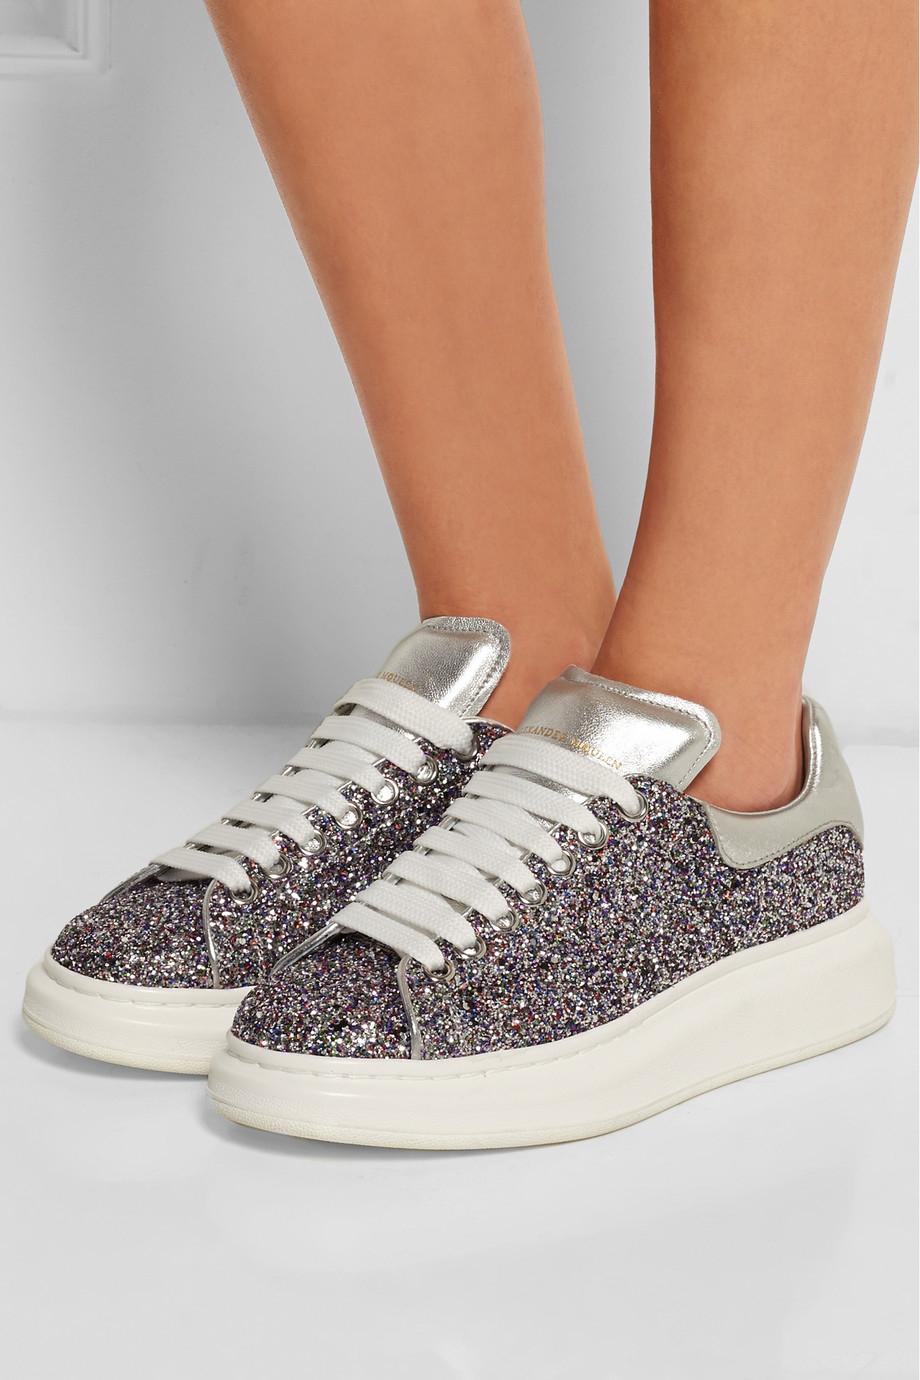 Glitter Nike Shoes Uk